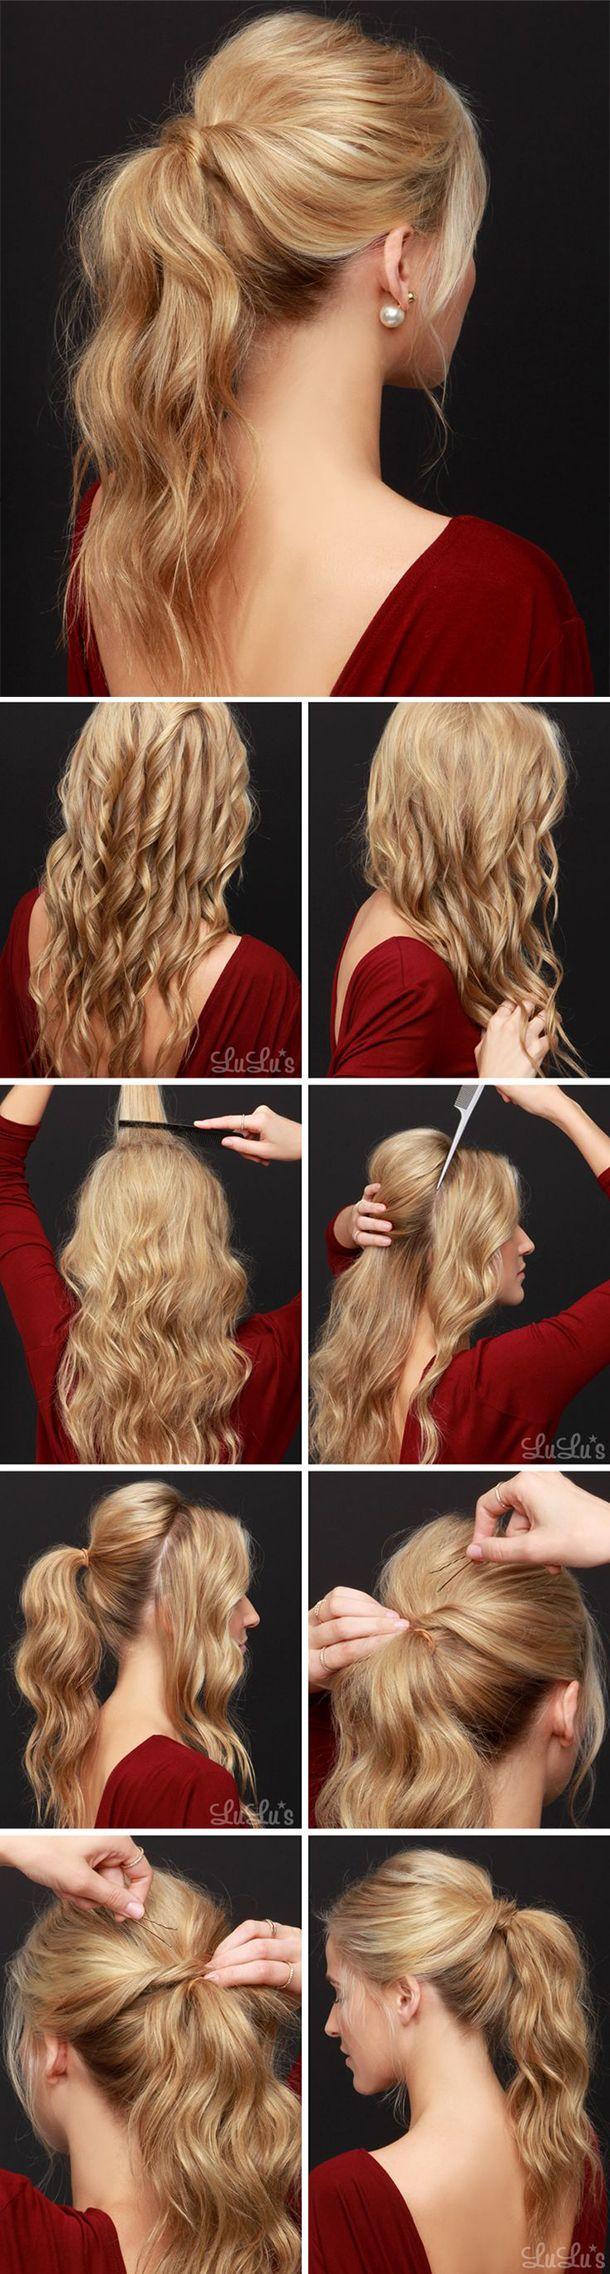 Prom Hair Styles                                                                                                                                                                                 Más